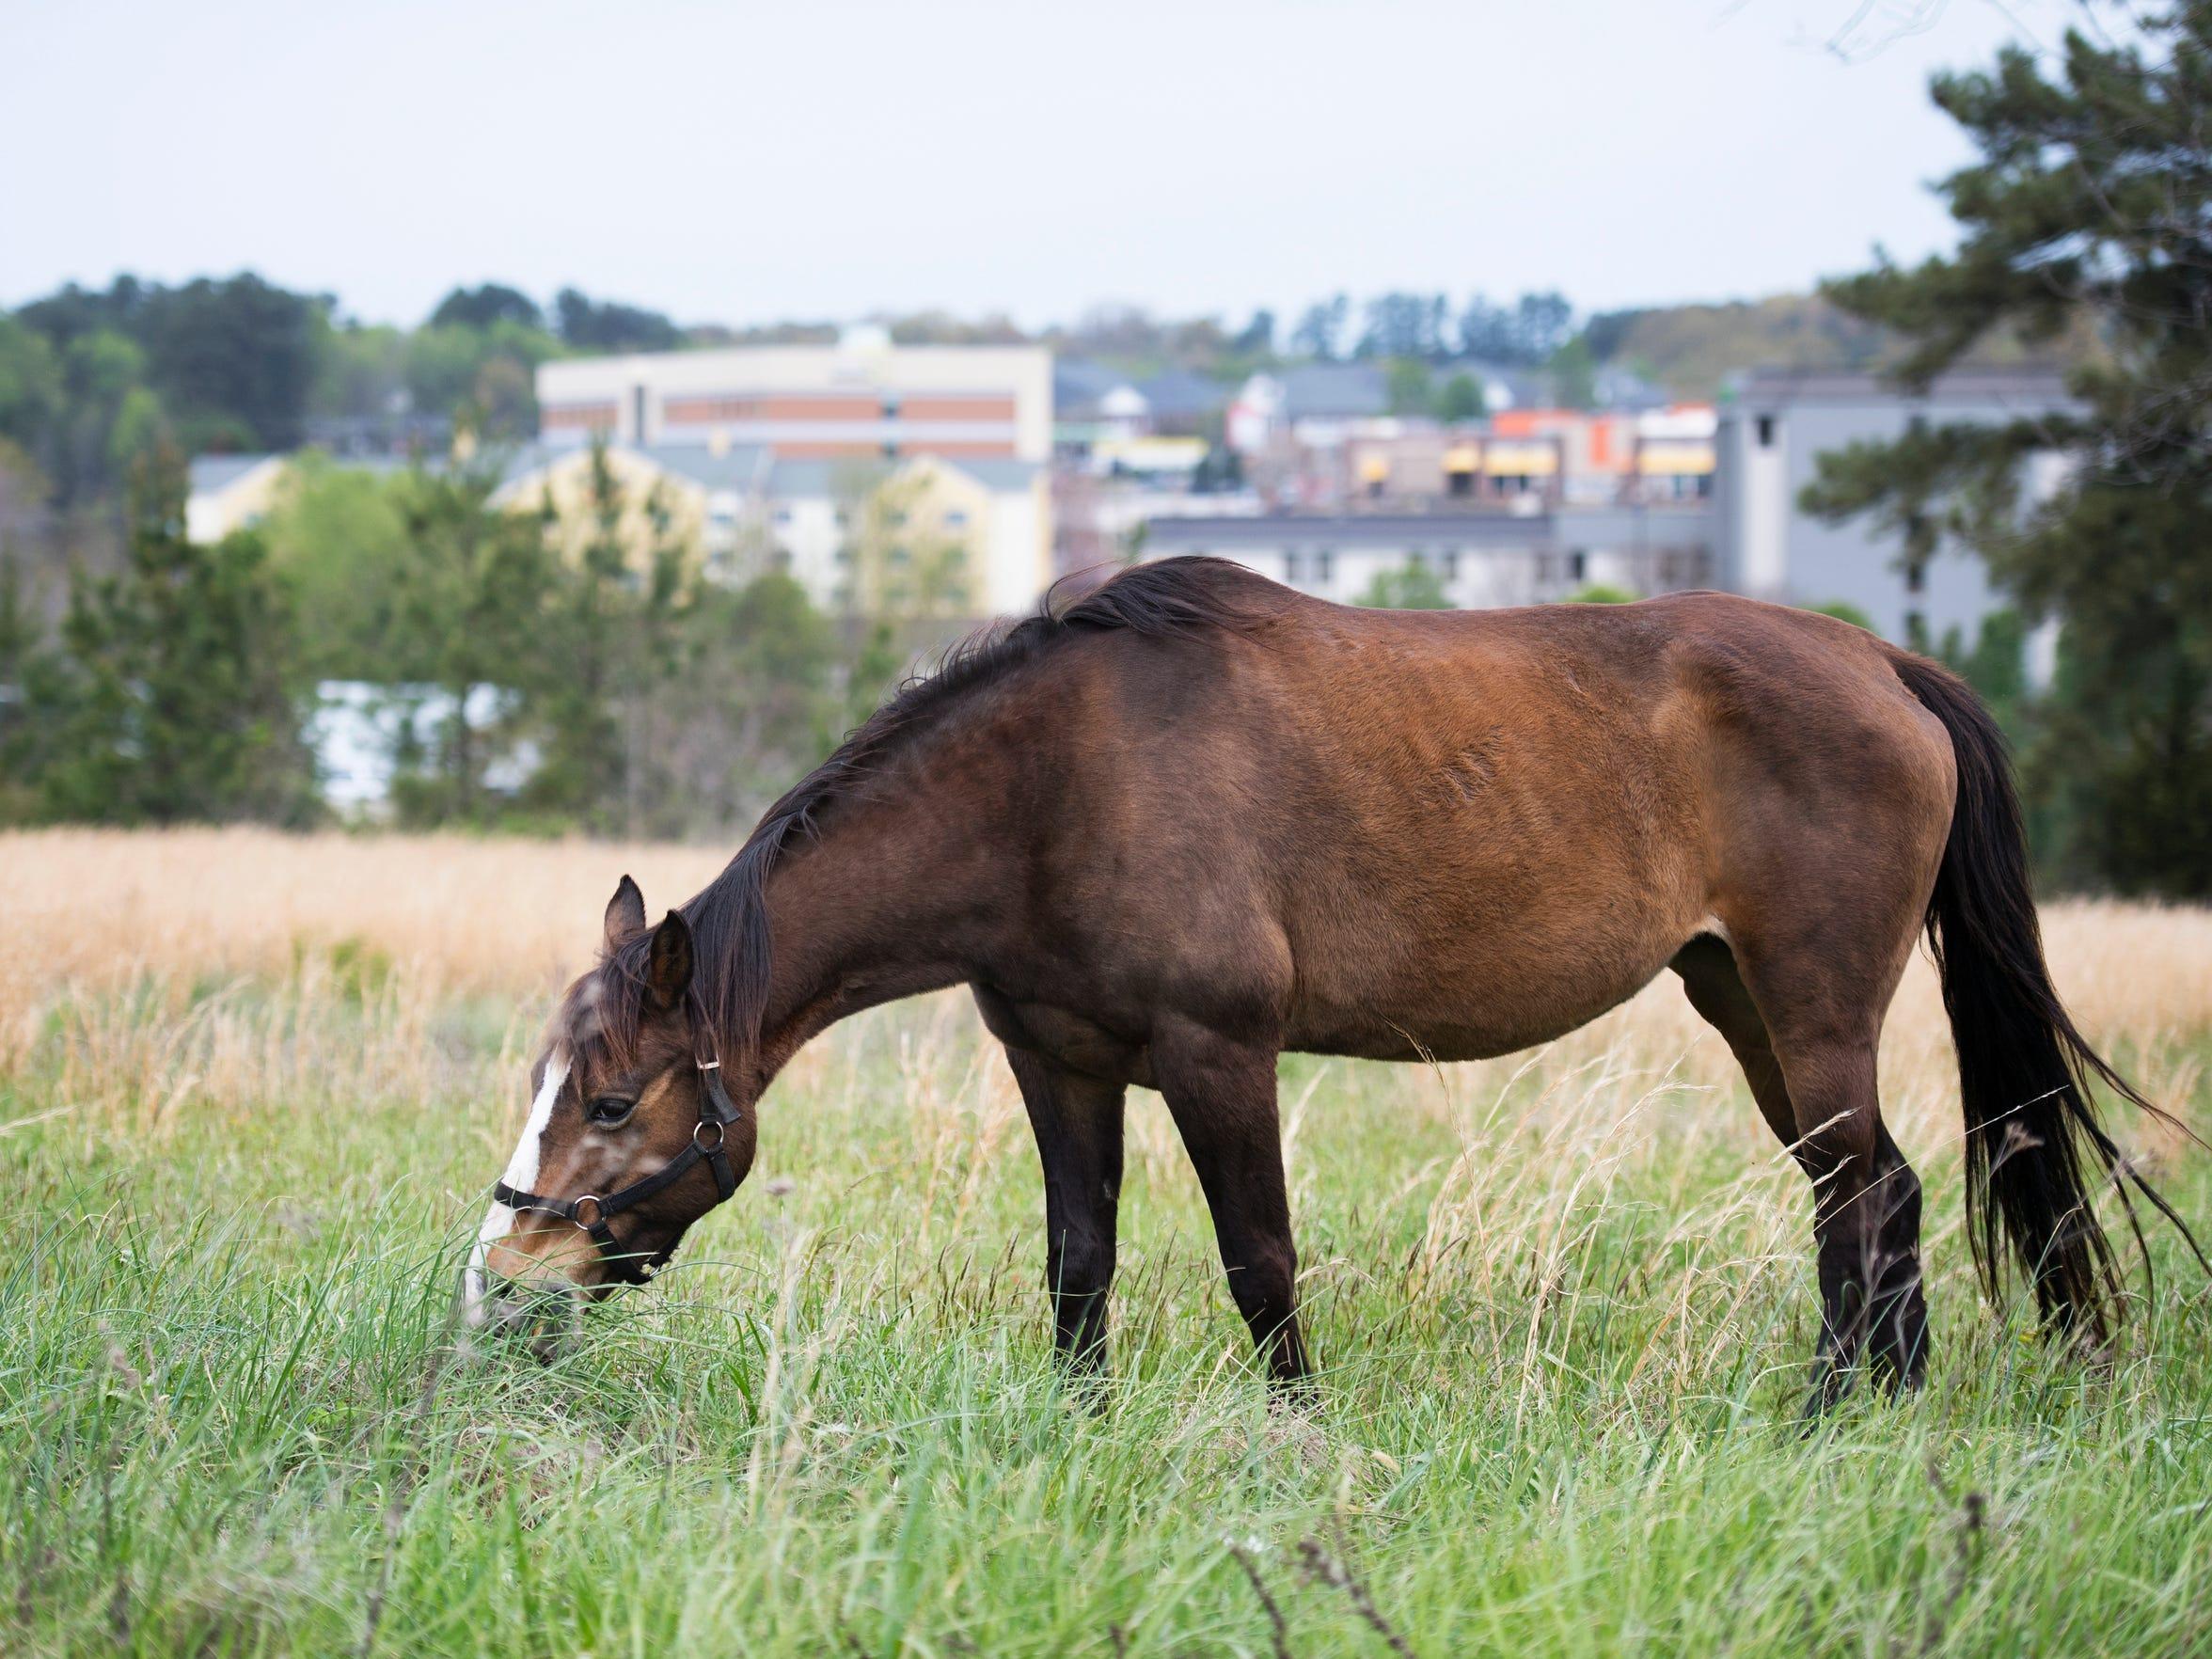 Fancy, the neighborhood horse, grazes in the grass